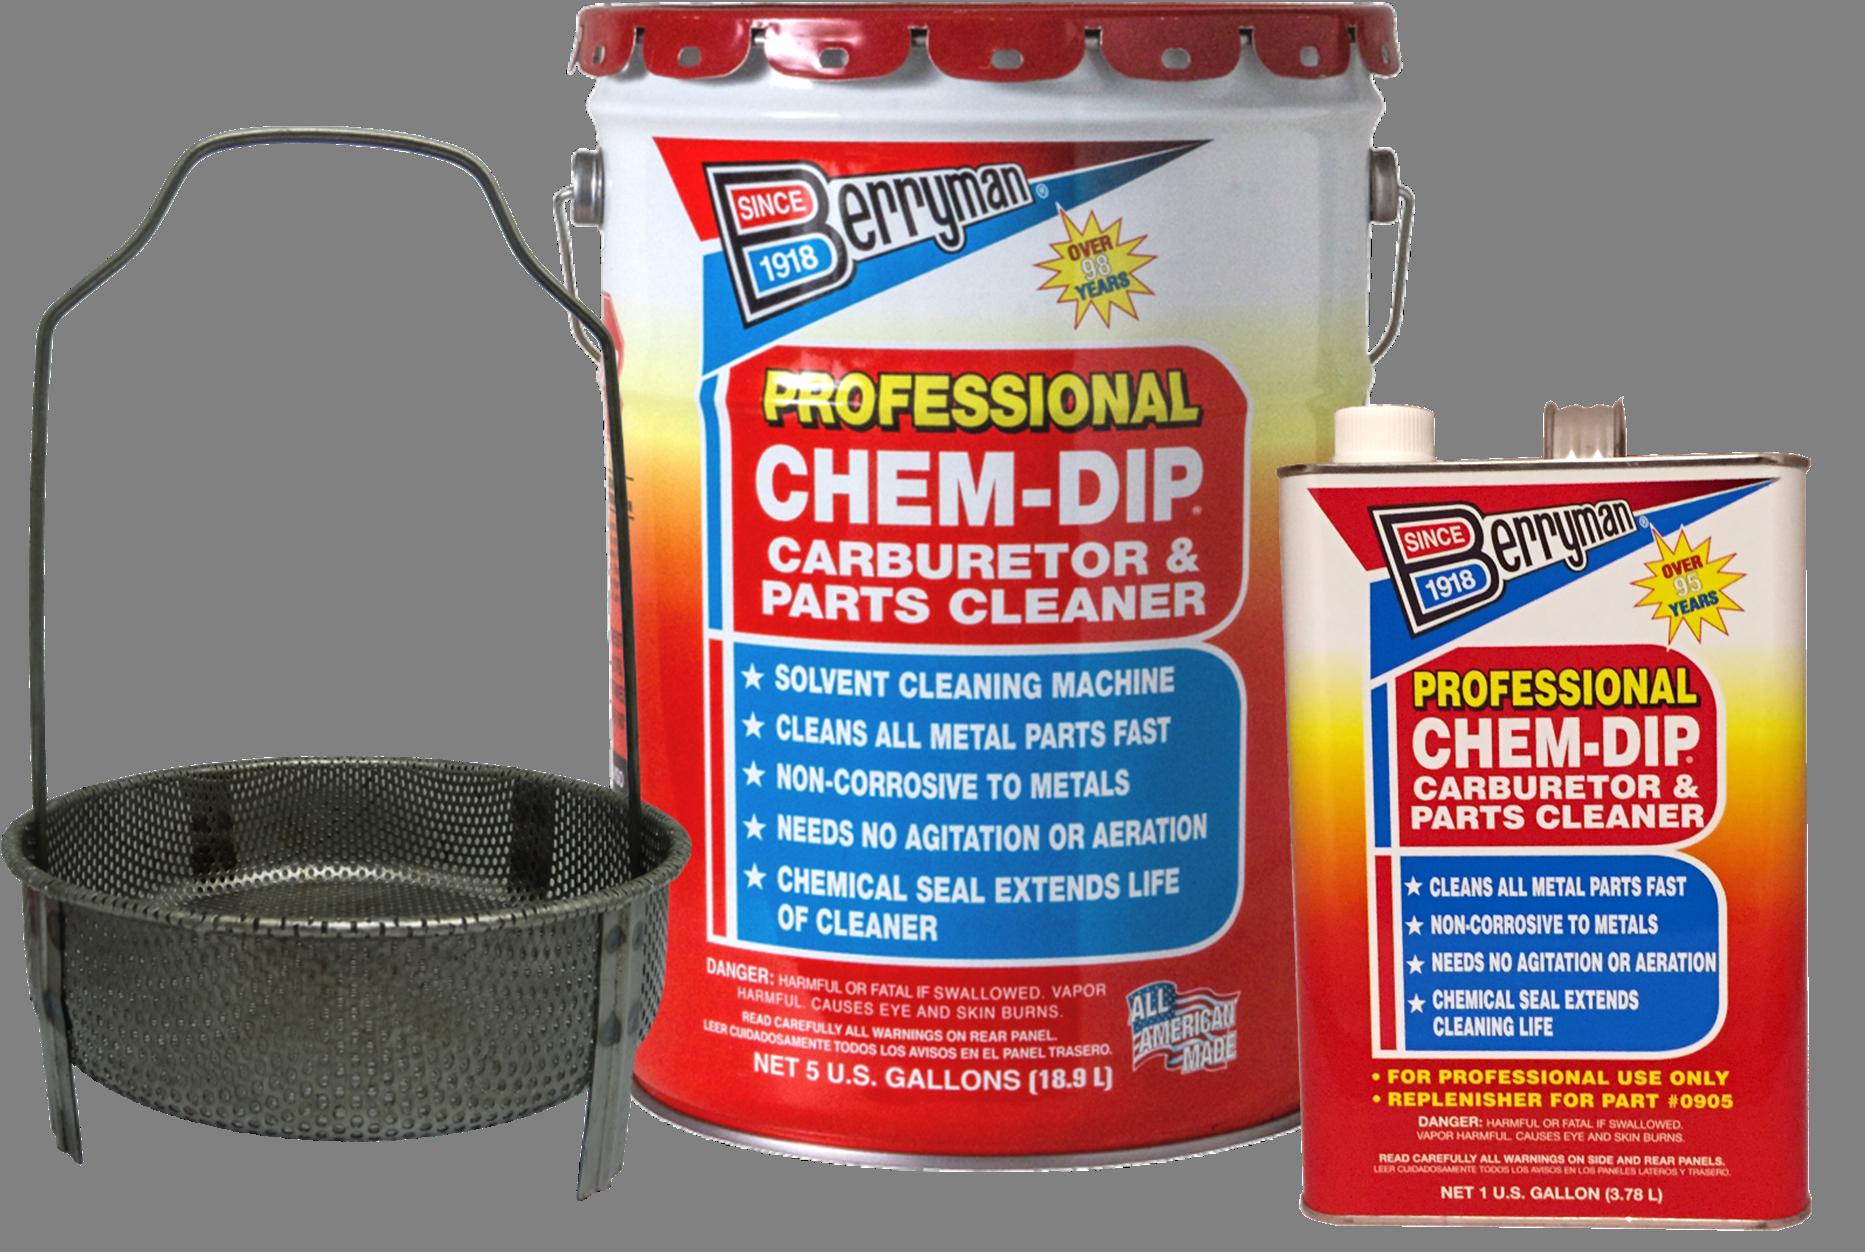 Berryman® Chem-Dip® Professional Parts Cleaner | Berryman